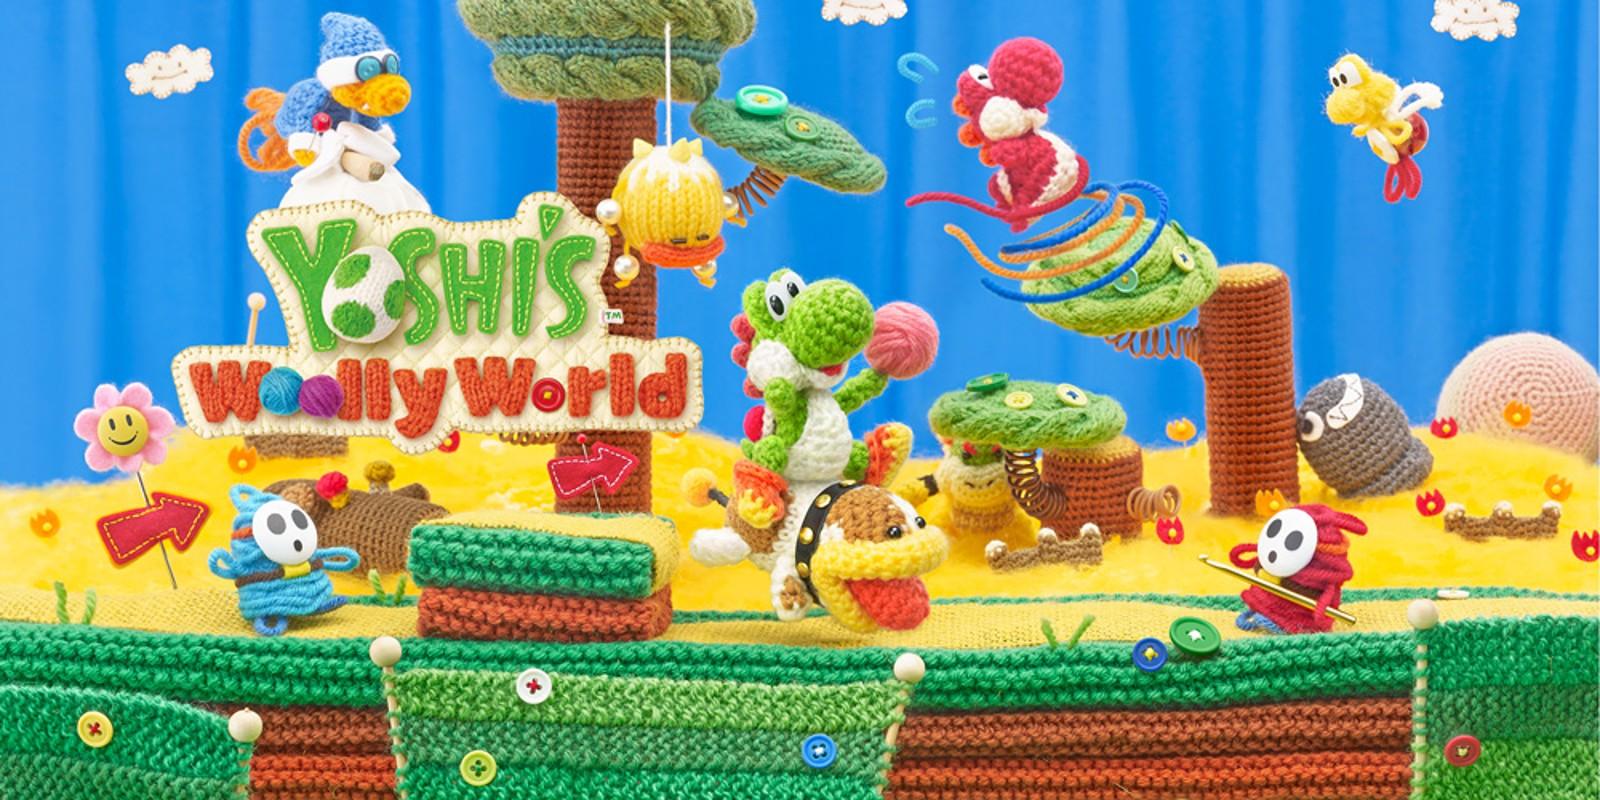 Yoshi's Woolly World | Wii U | Giochi | Nintendo